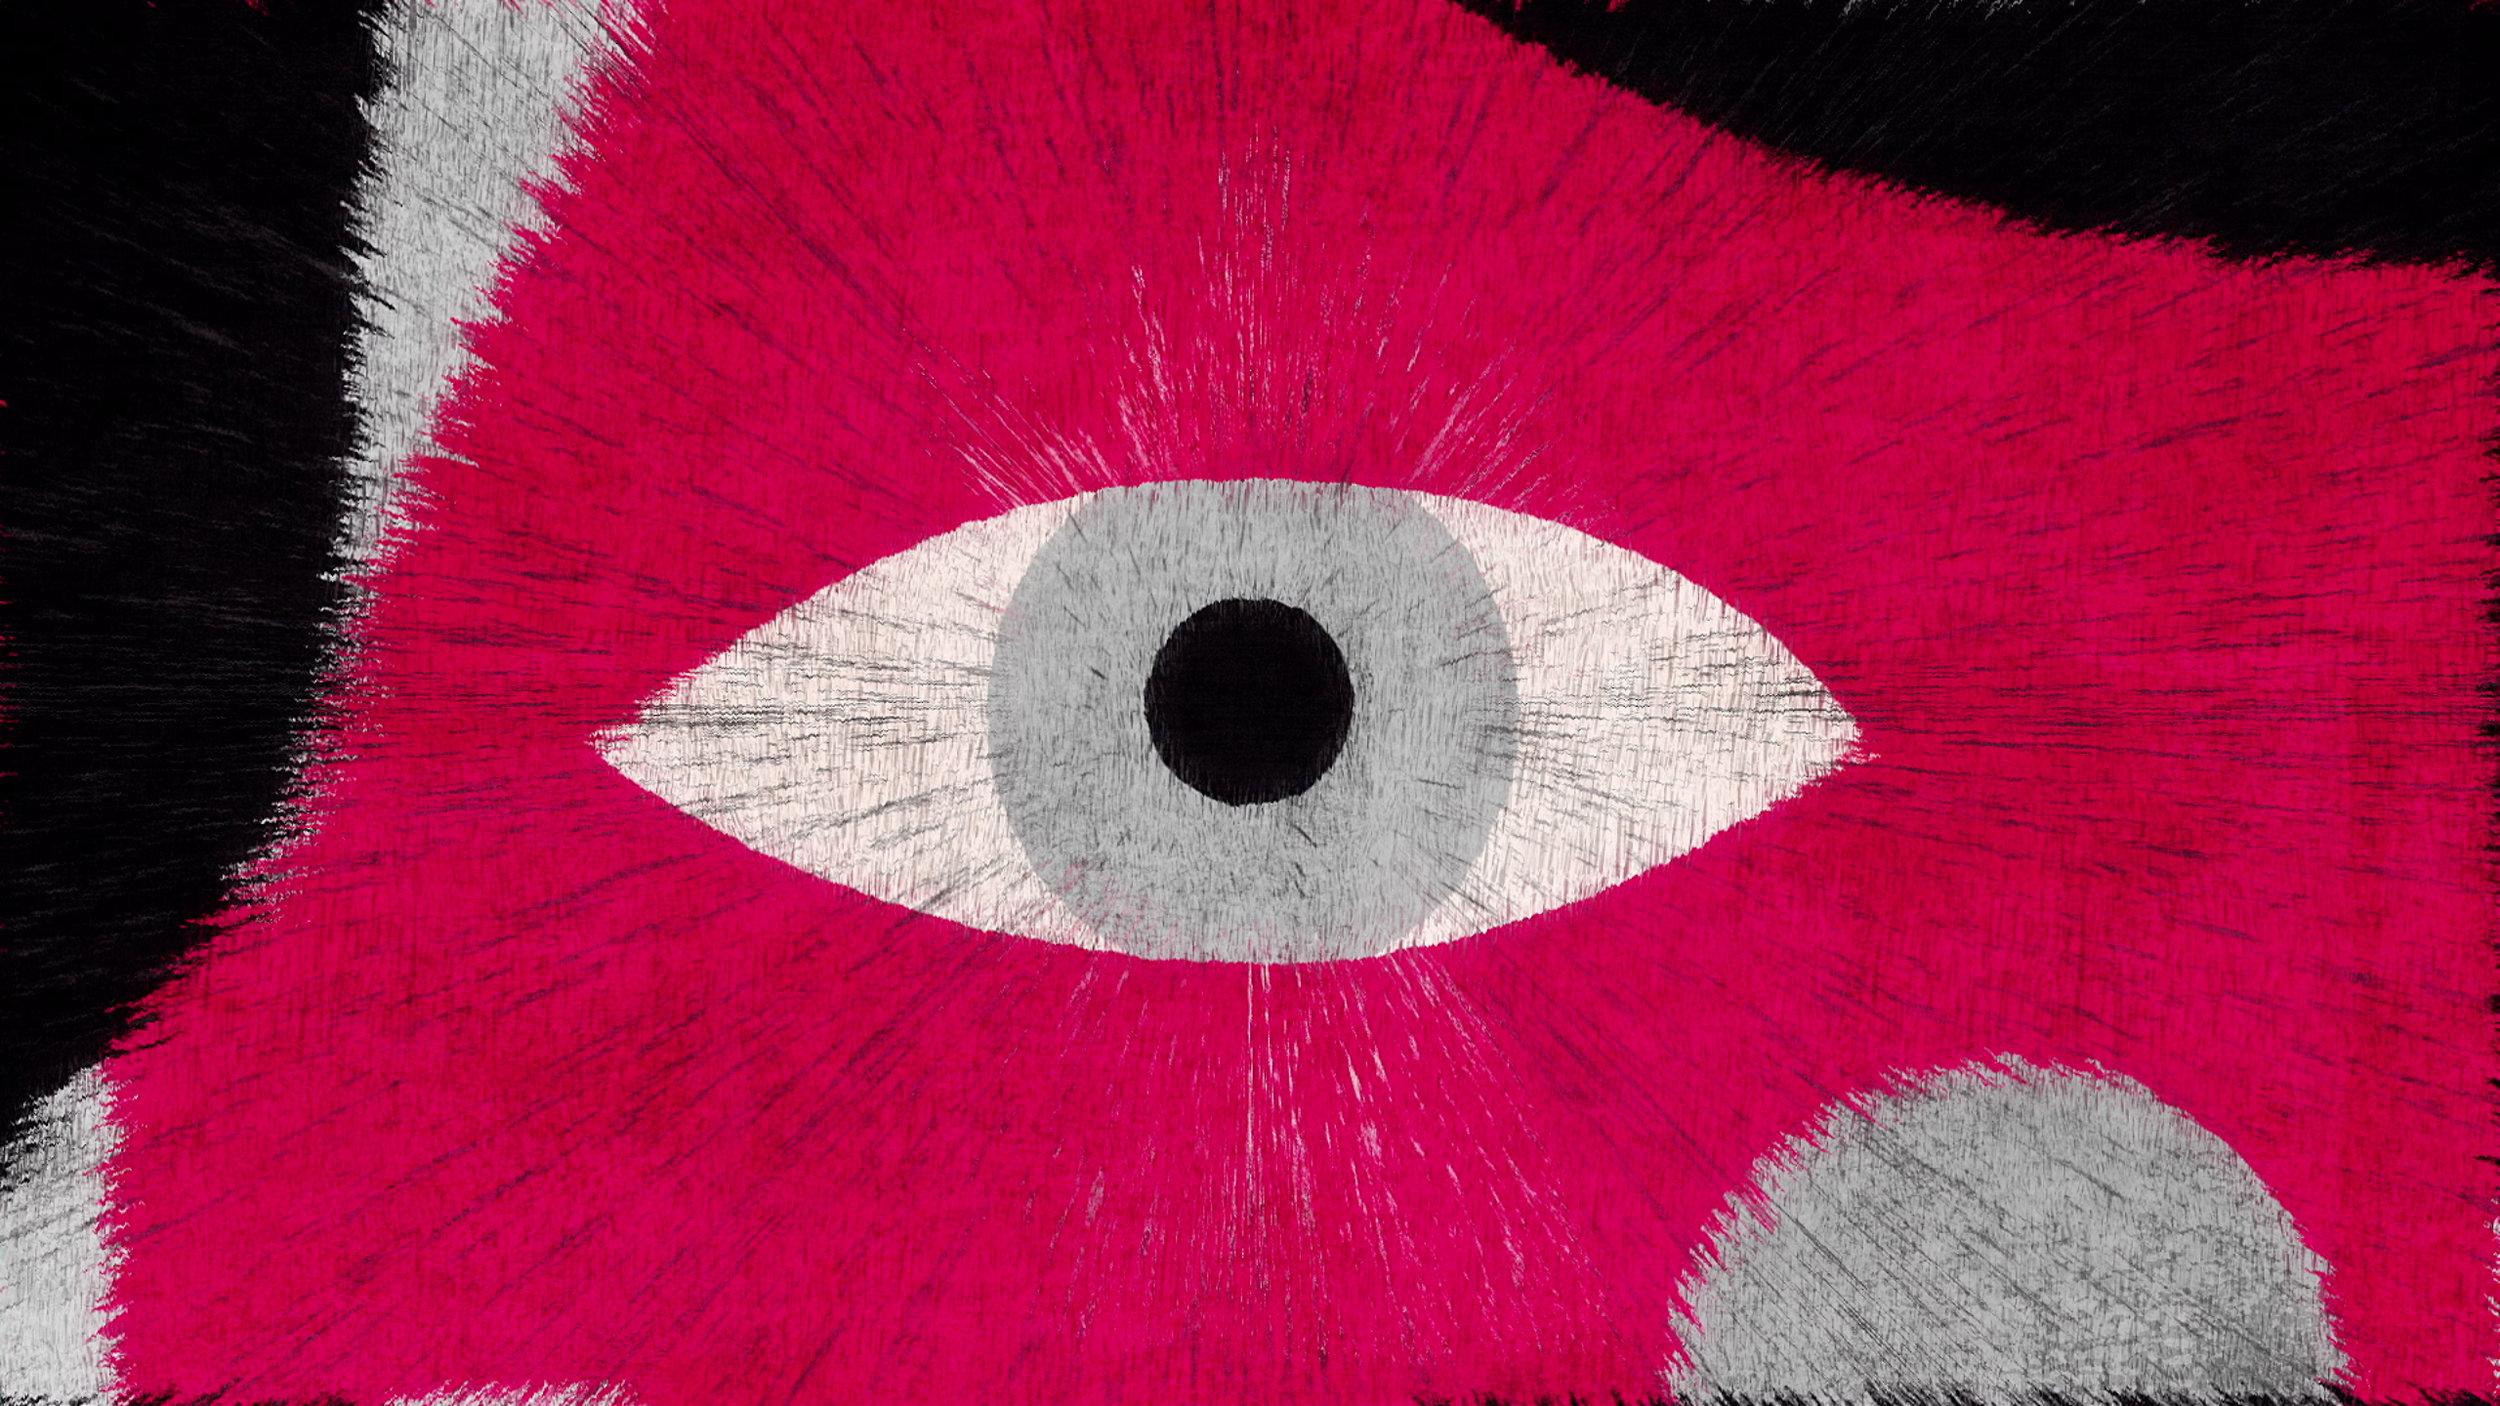 illustration-entering-woman-eye.jpg